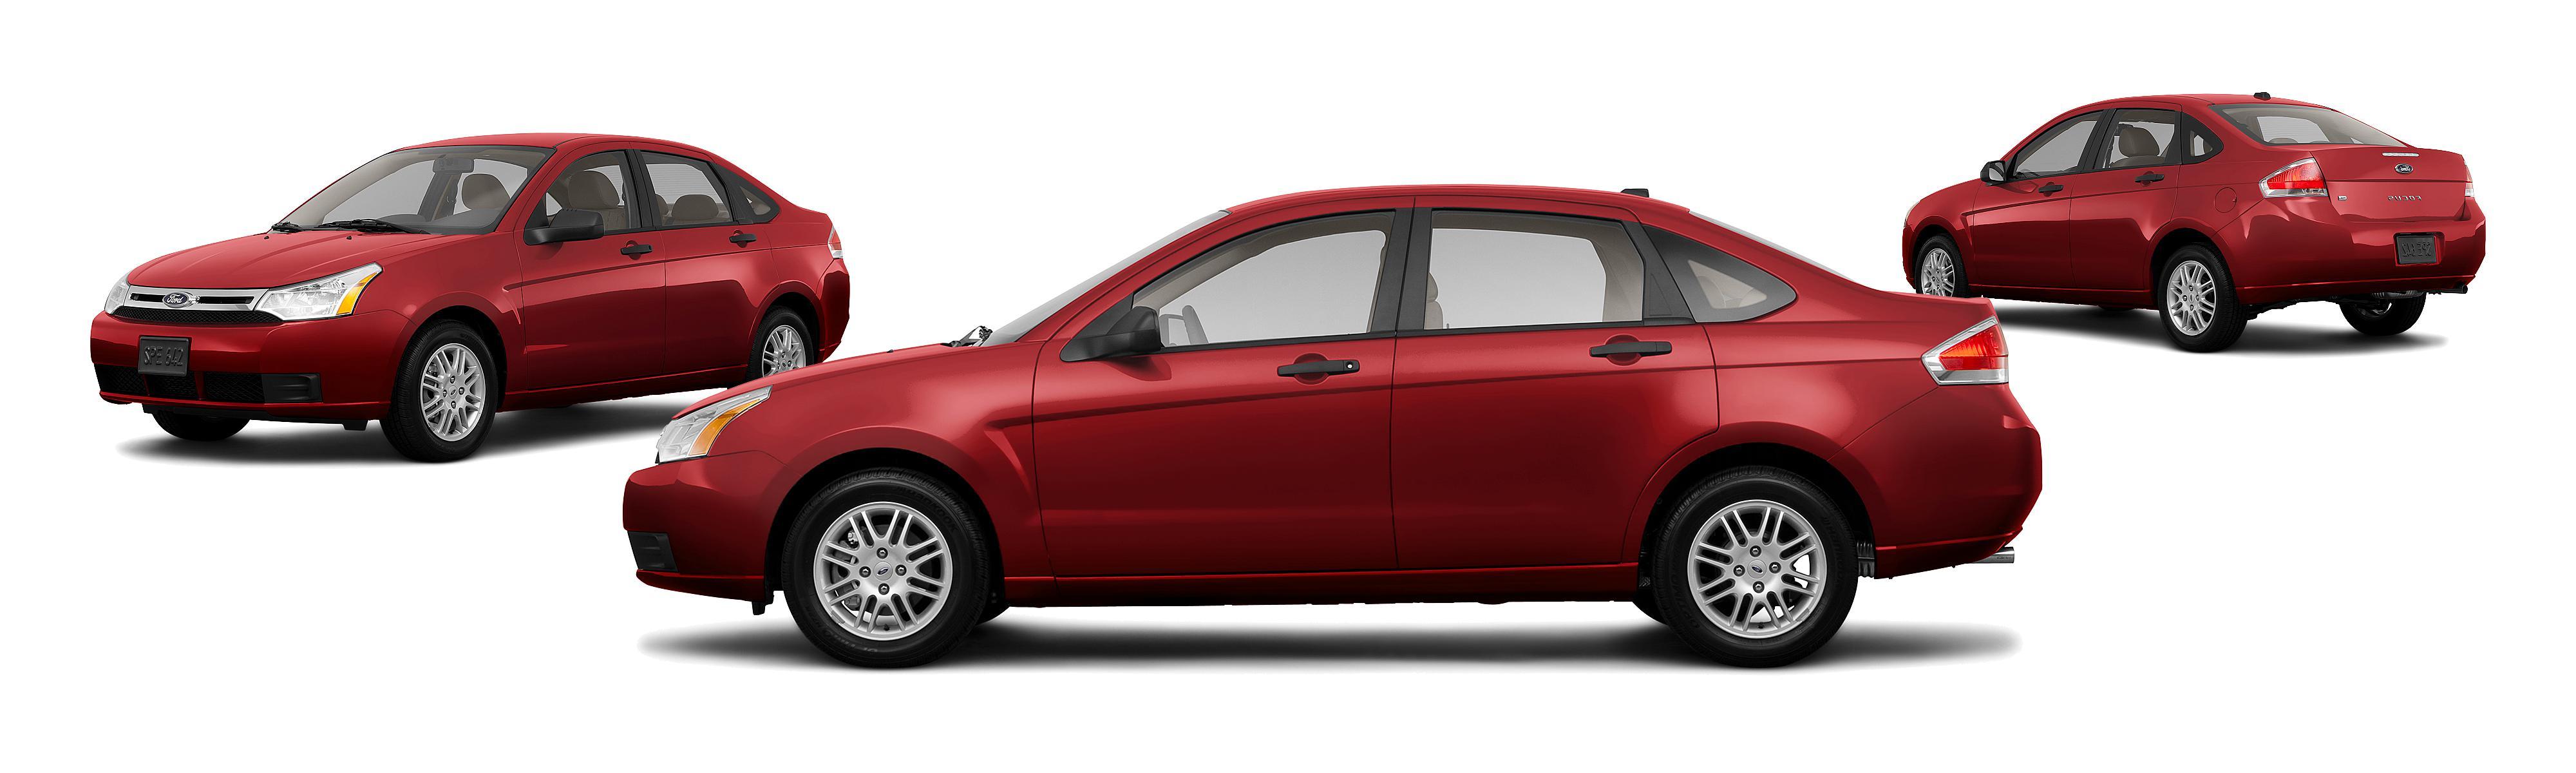 2011 Ford Focus SE 4dr Sedan Research GrooveCar